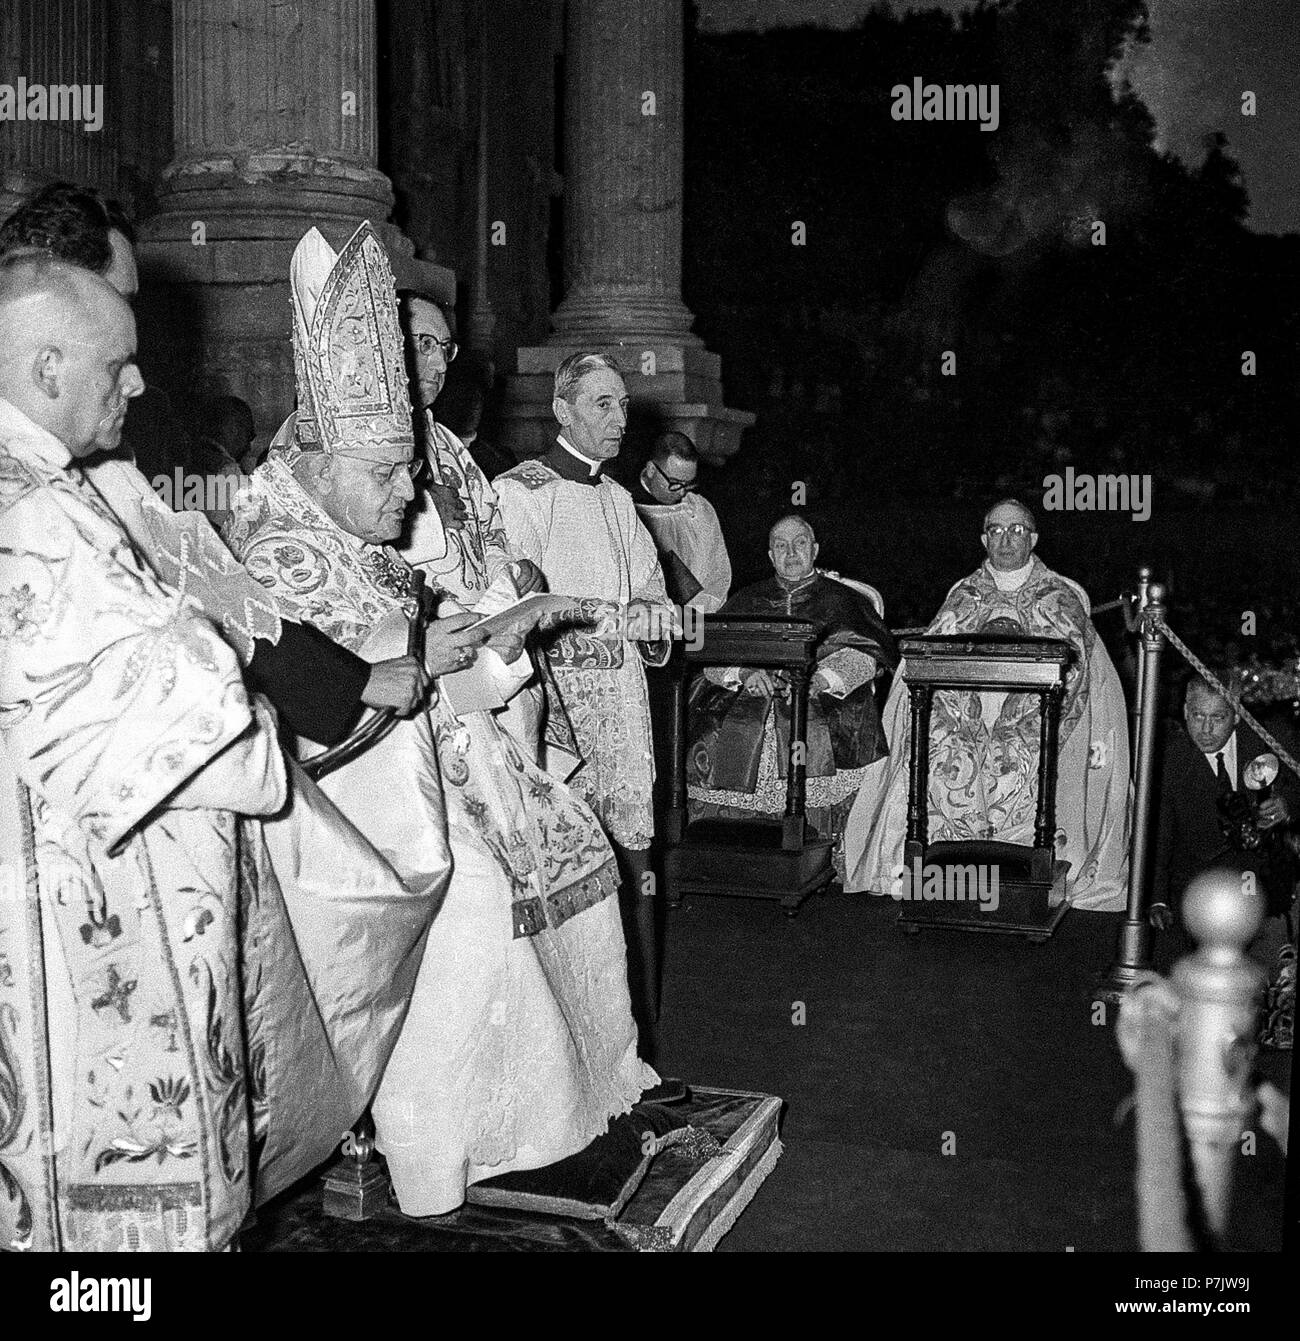 italy Rome Pope John XXIII - Procession of Corpus Domini - June 16, 1960 - Stock Image